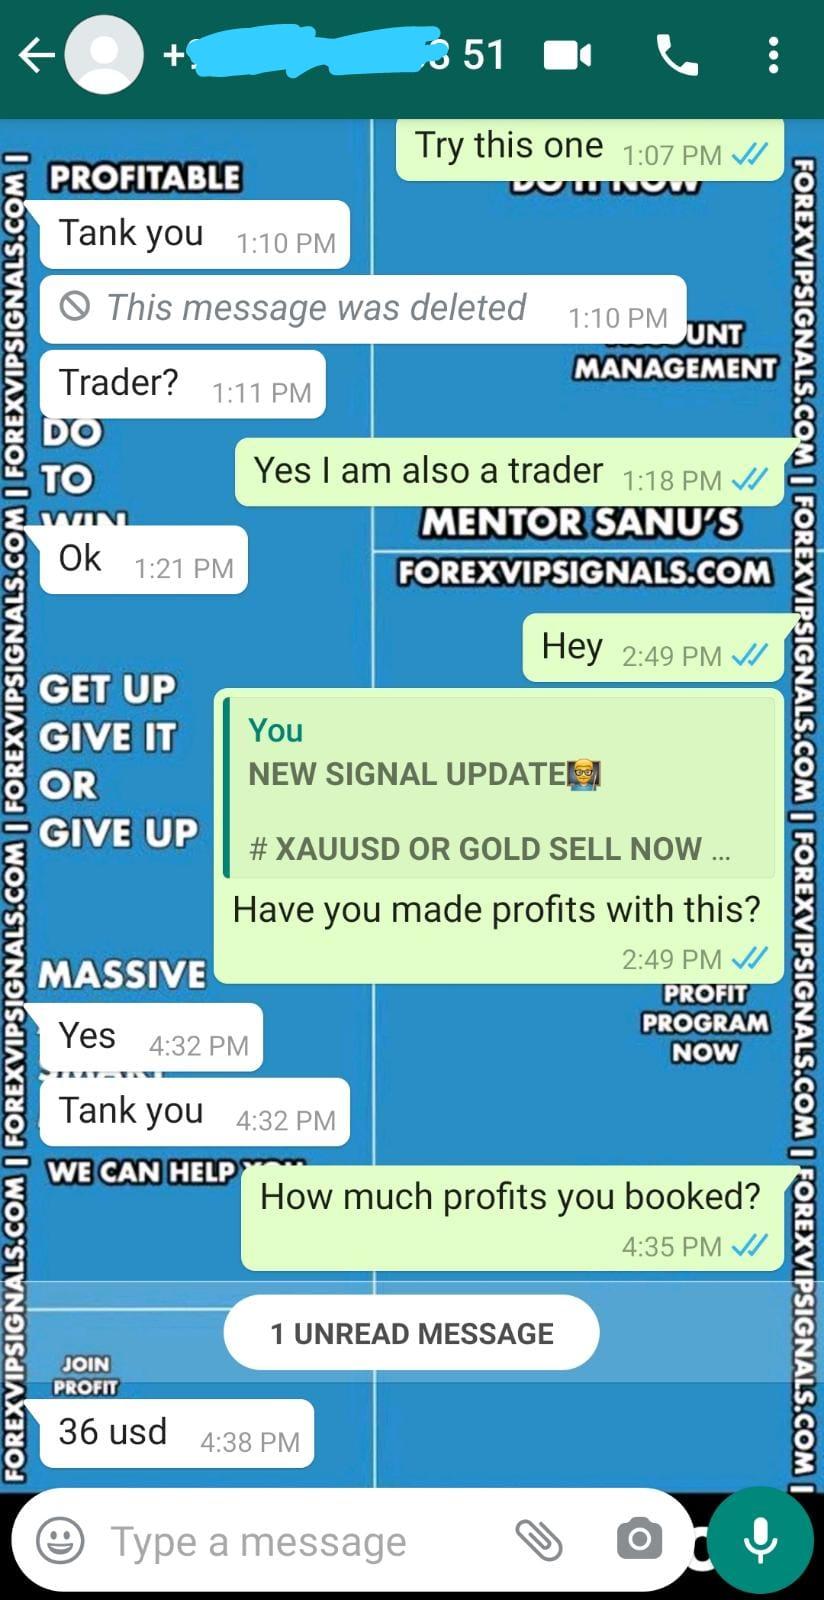 mt4 signals with forex vip signals